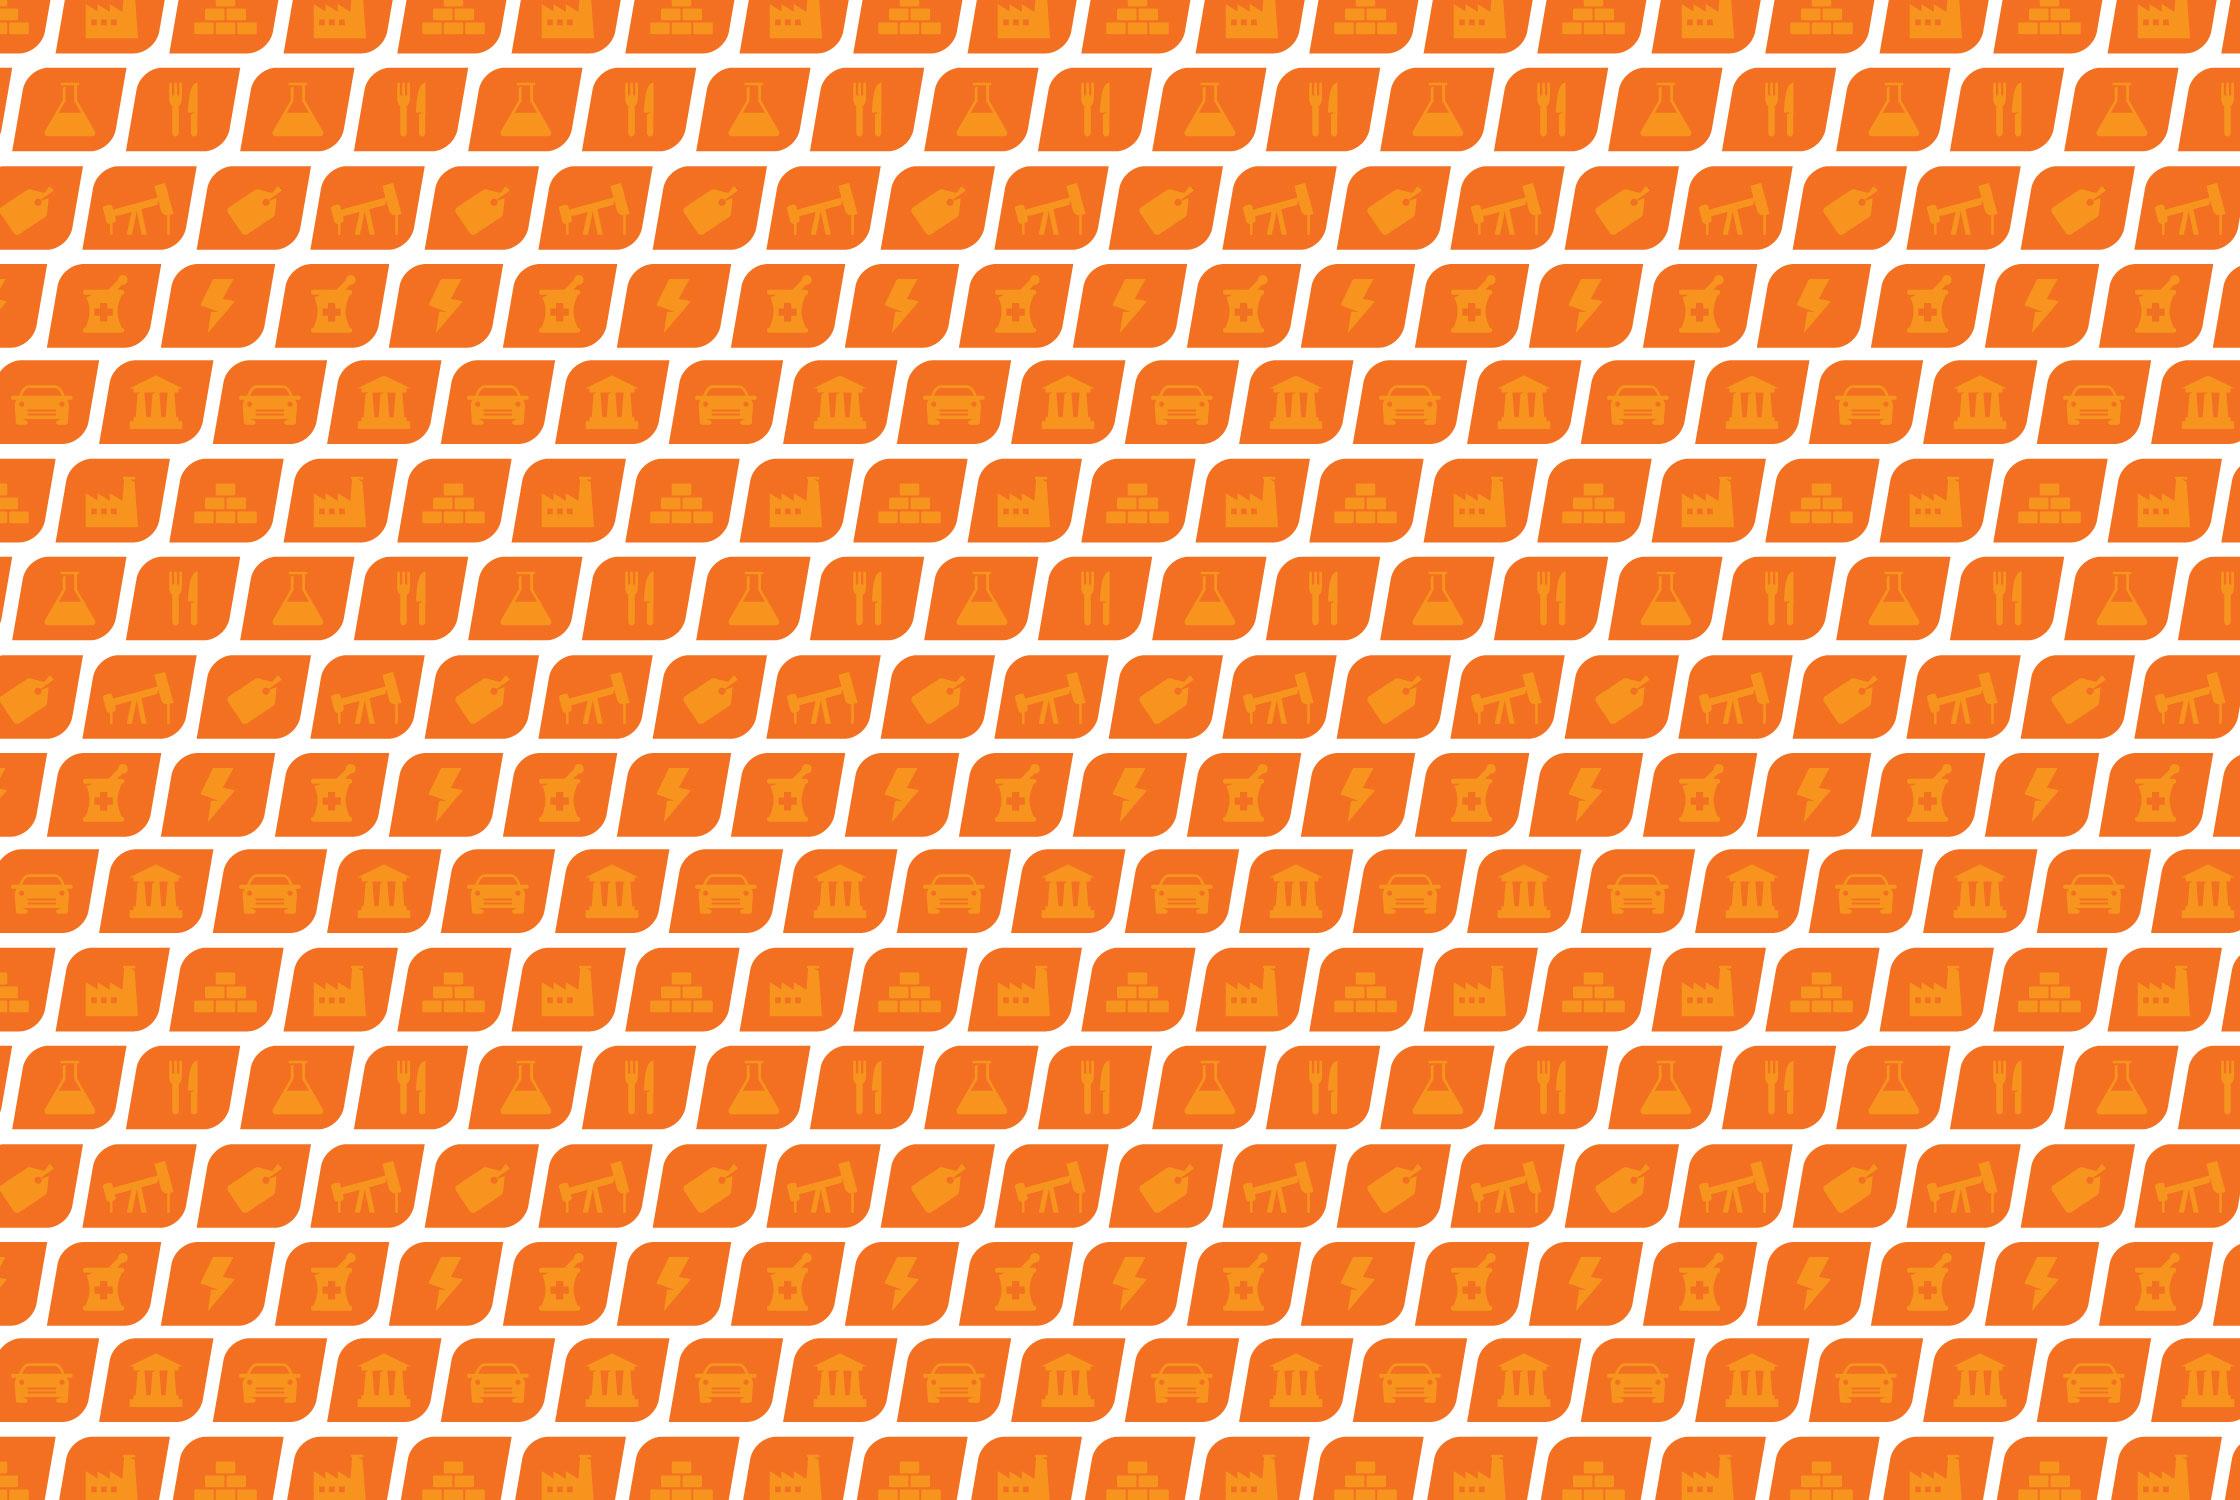 WEBSITE_SHAWK_PatternIcons